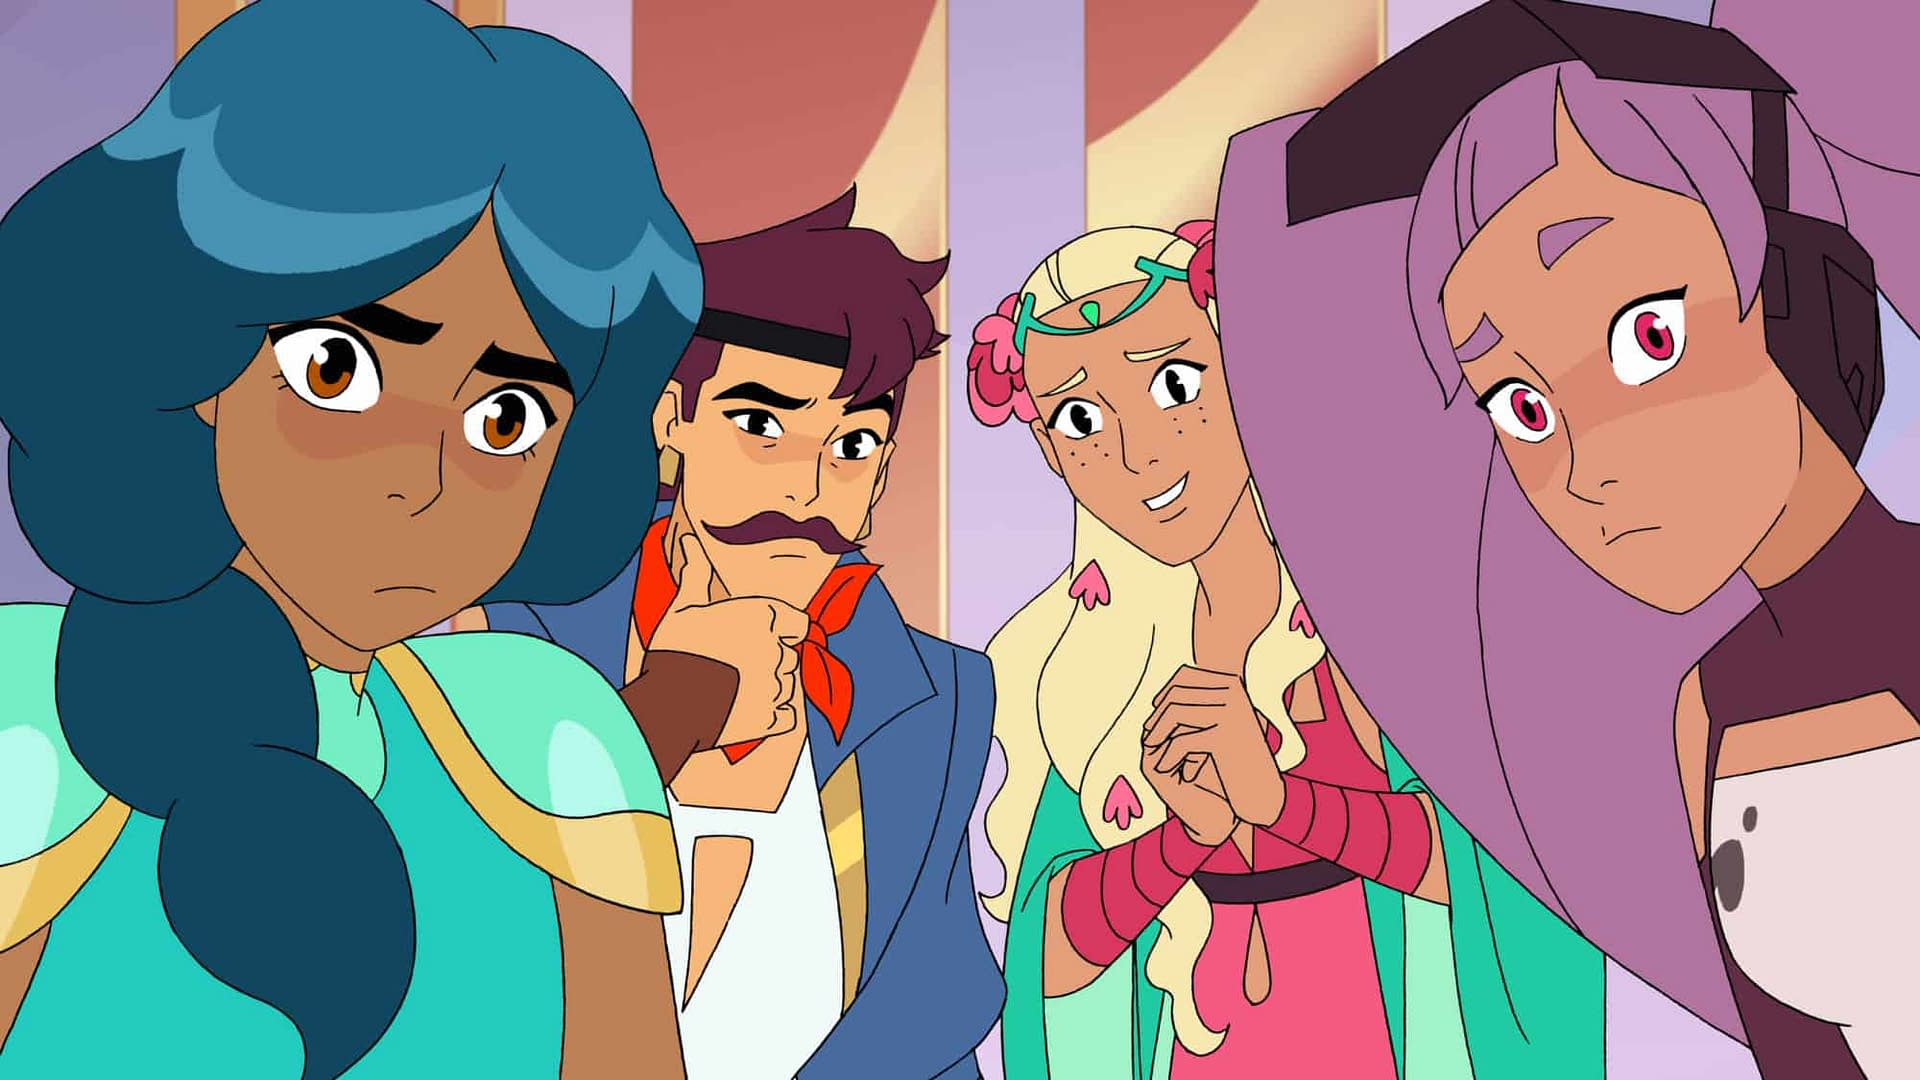 'She-Ra and the Princesses of Power' Season 2: A Half-Season Posing as a Full Season [SPOILER REVIEW]